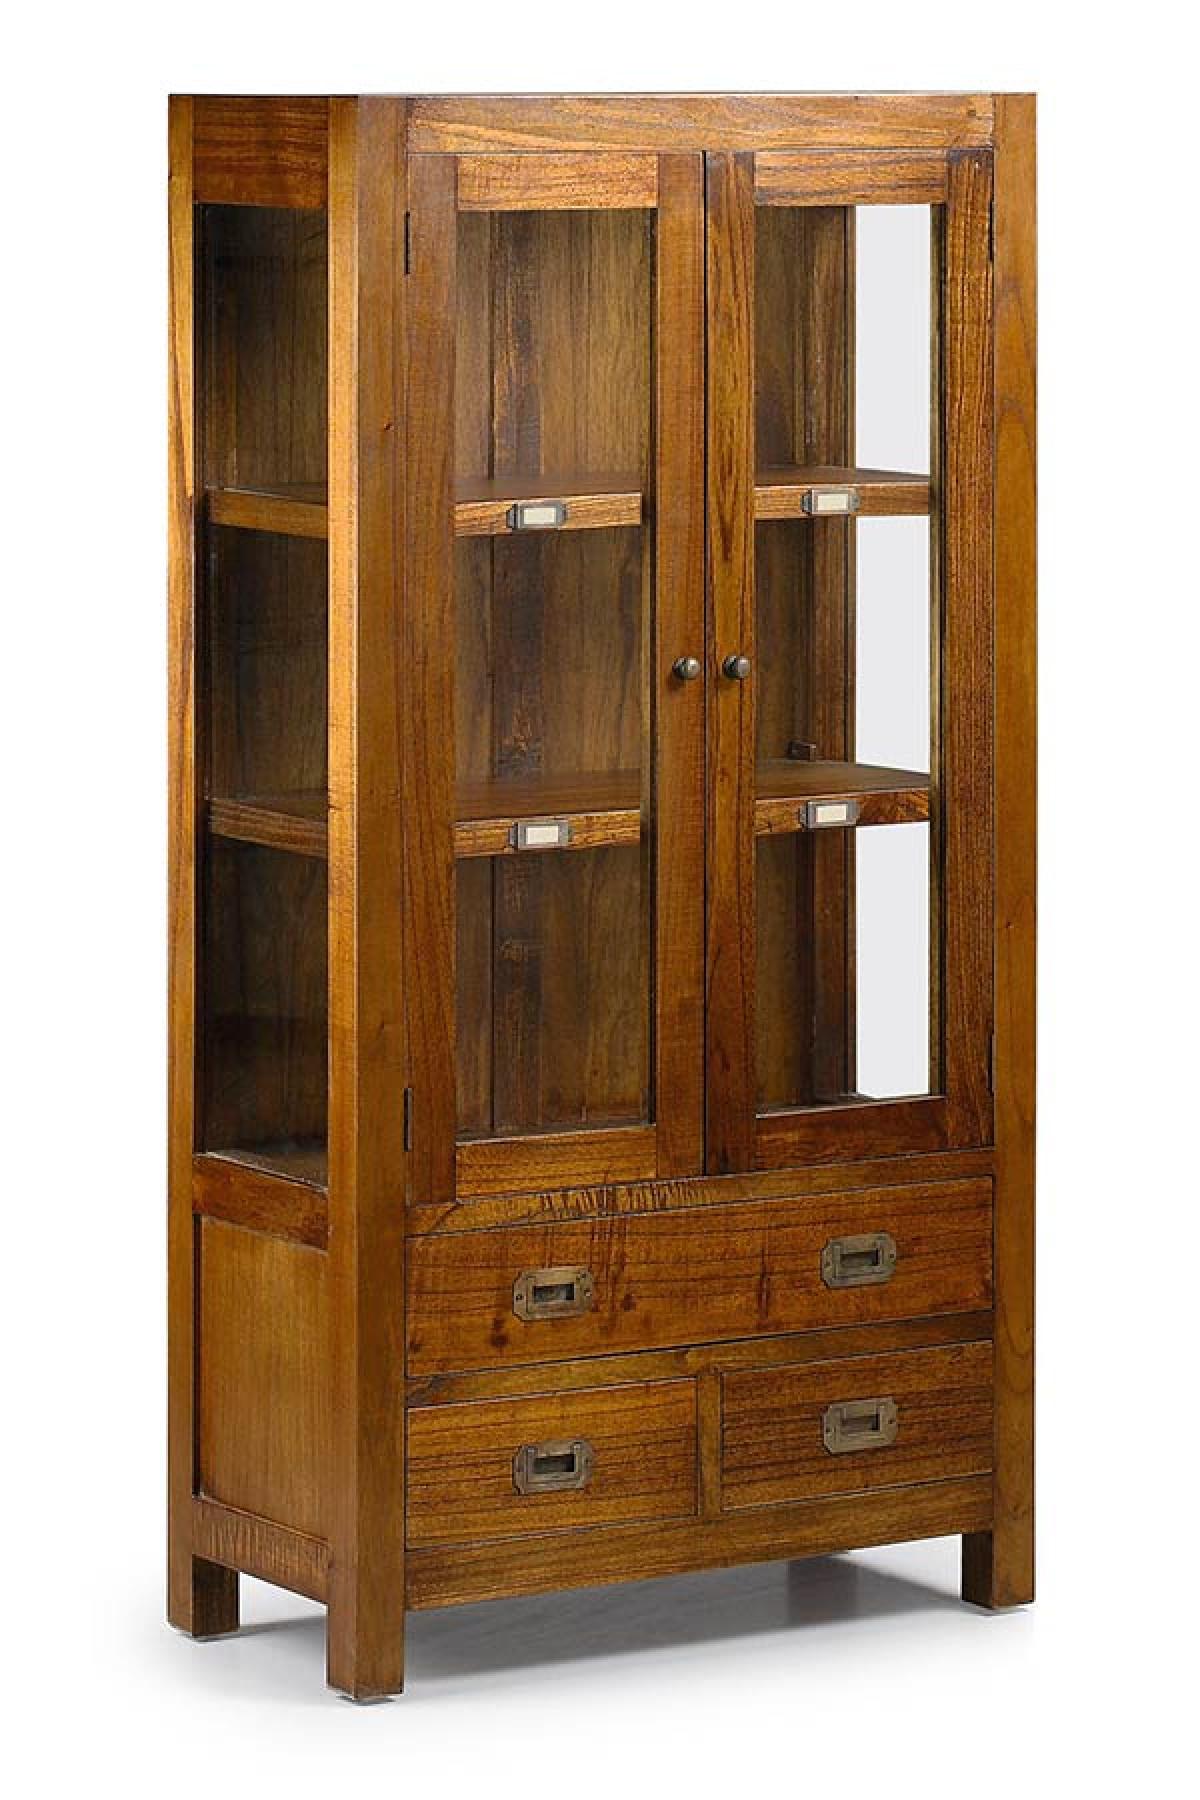 meuble vitrine en verre bois de mindy collection mawan